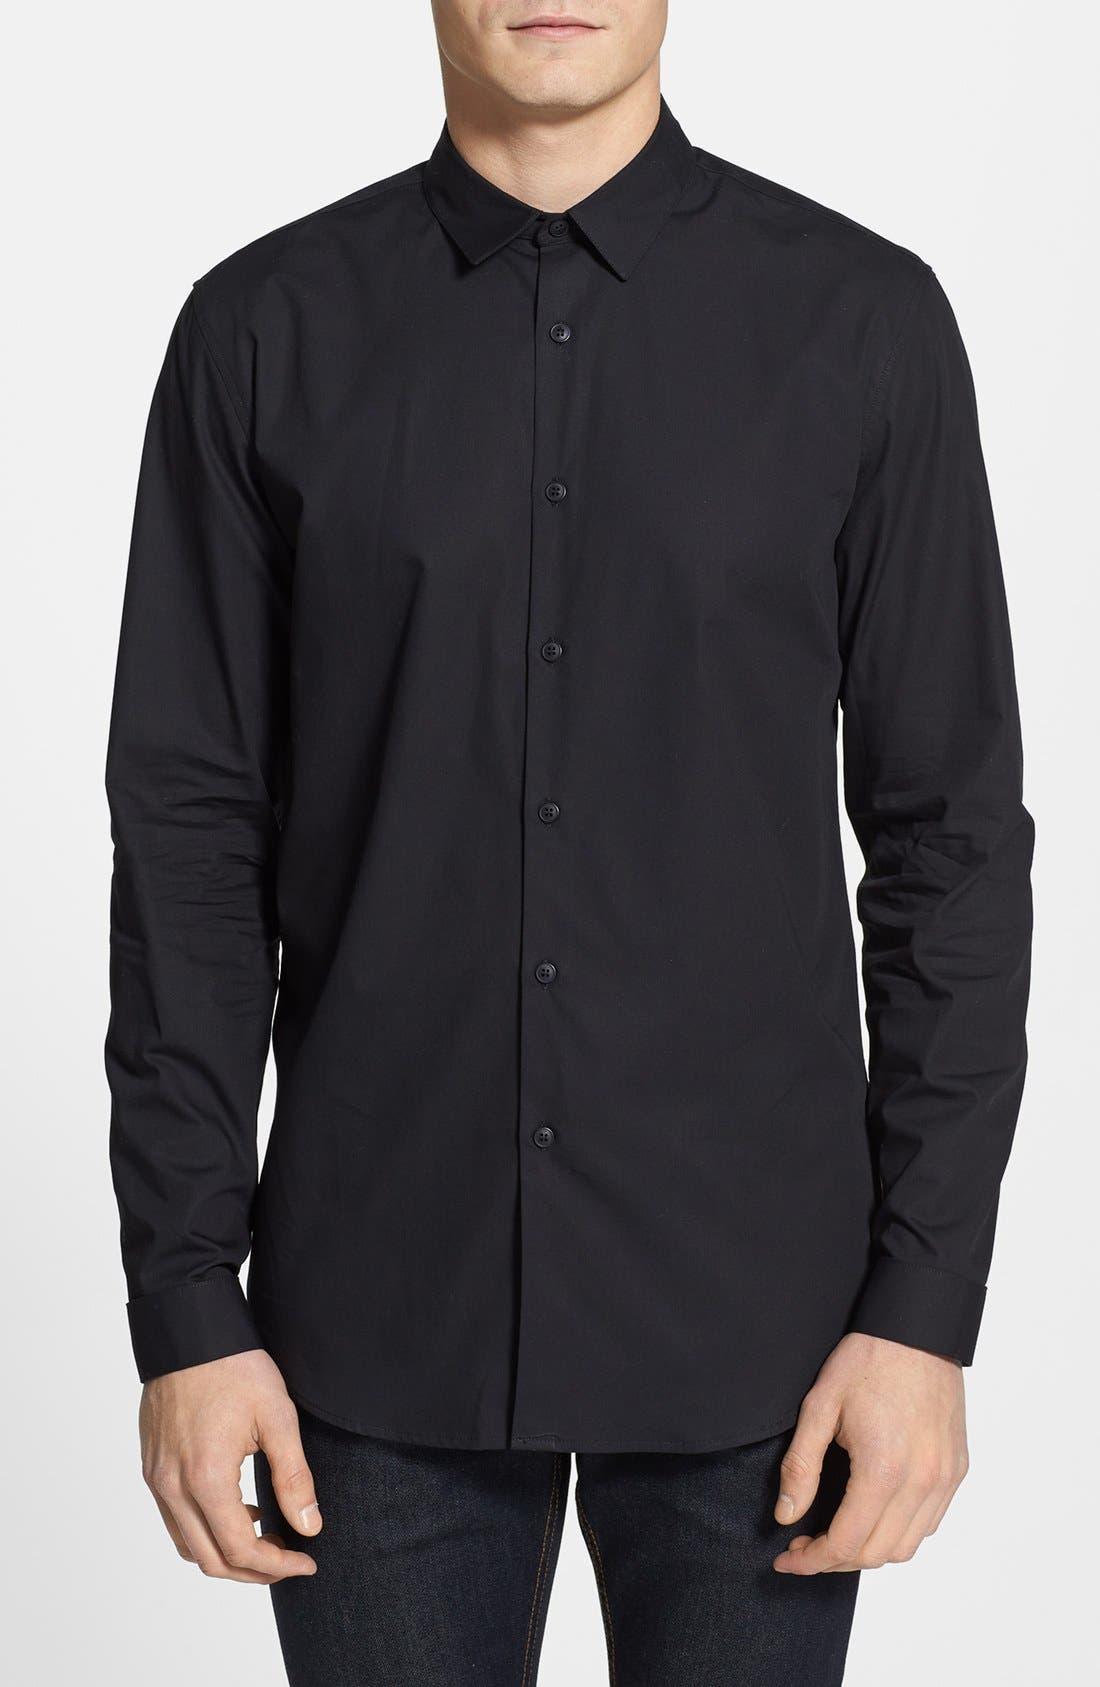 Main Image - Topman French Cuff Dress Shirt